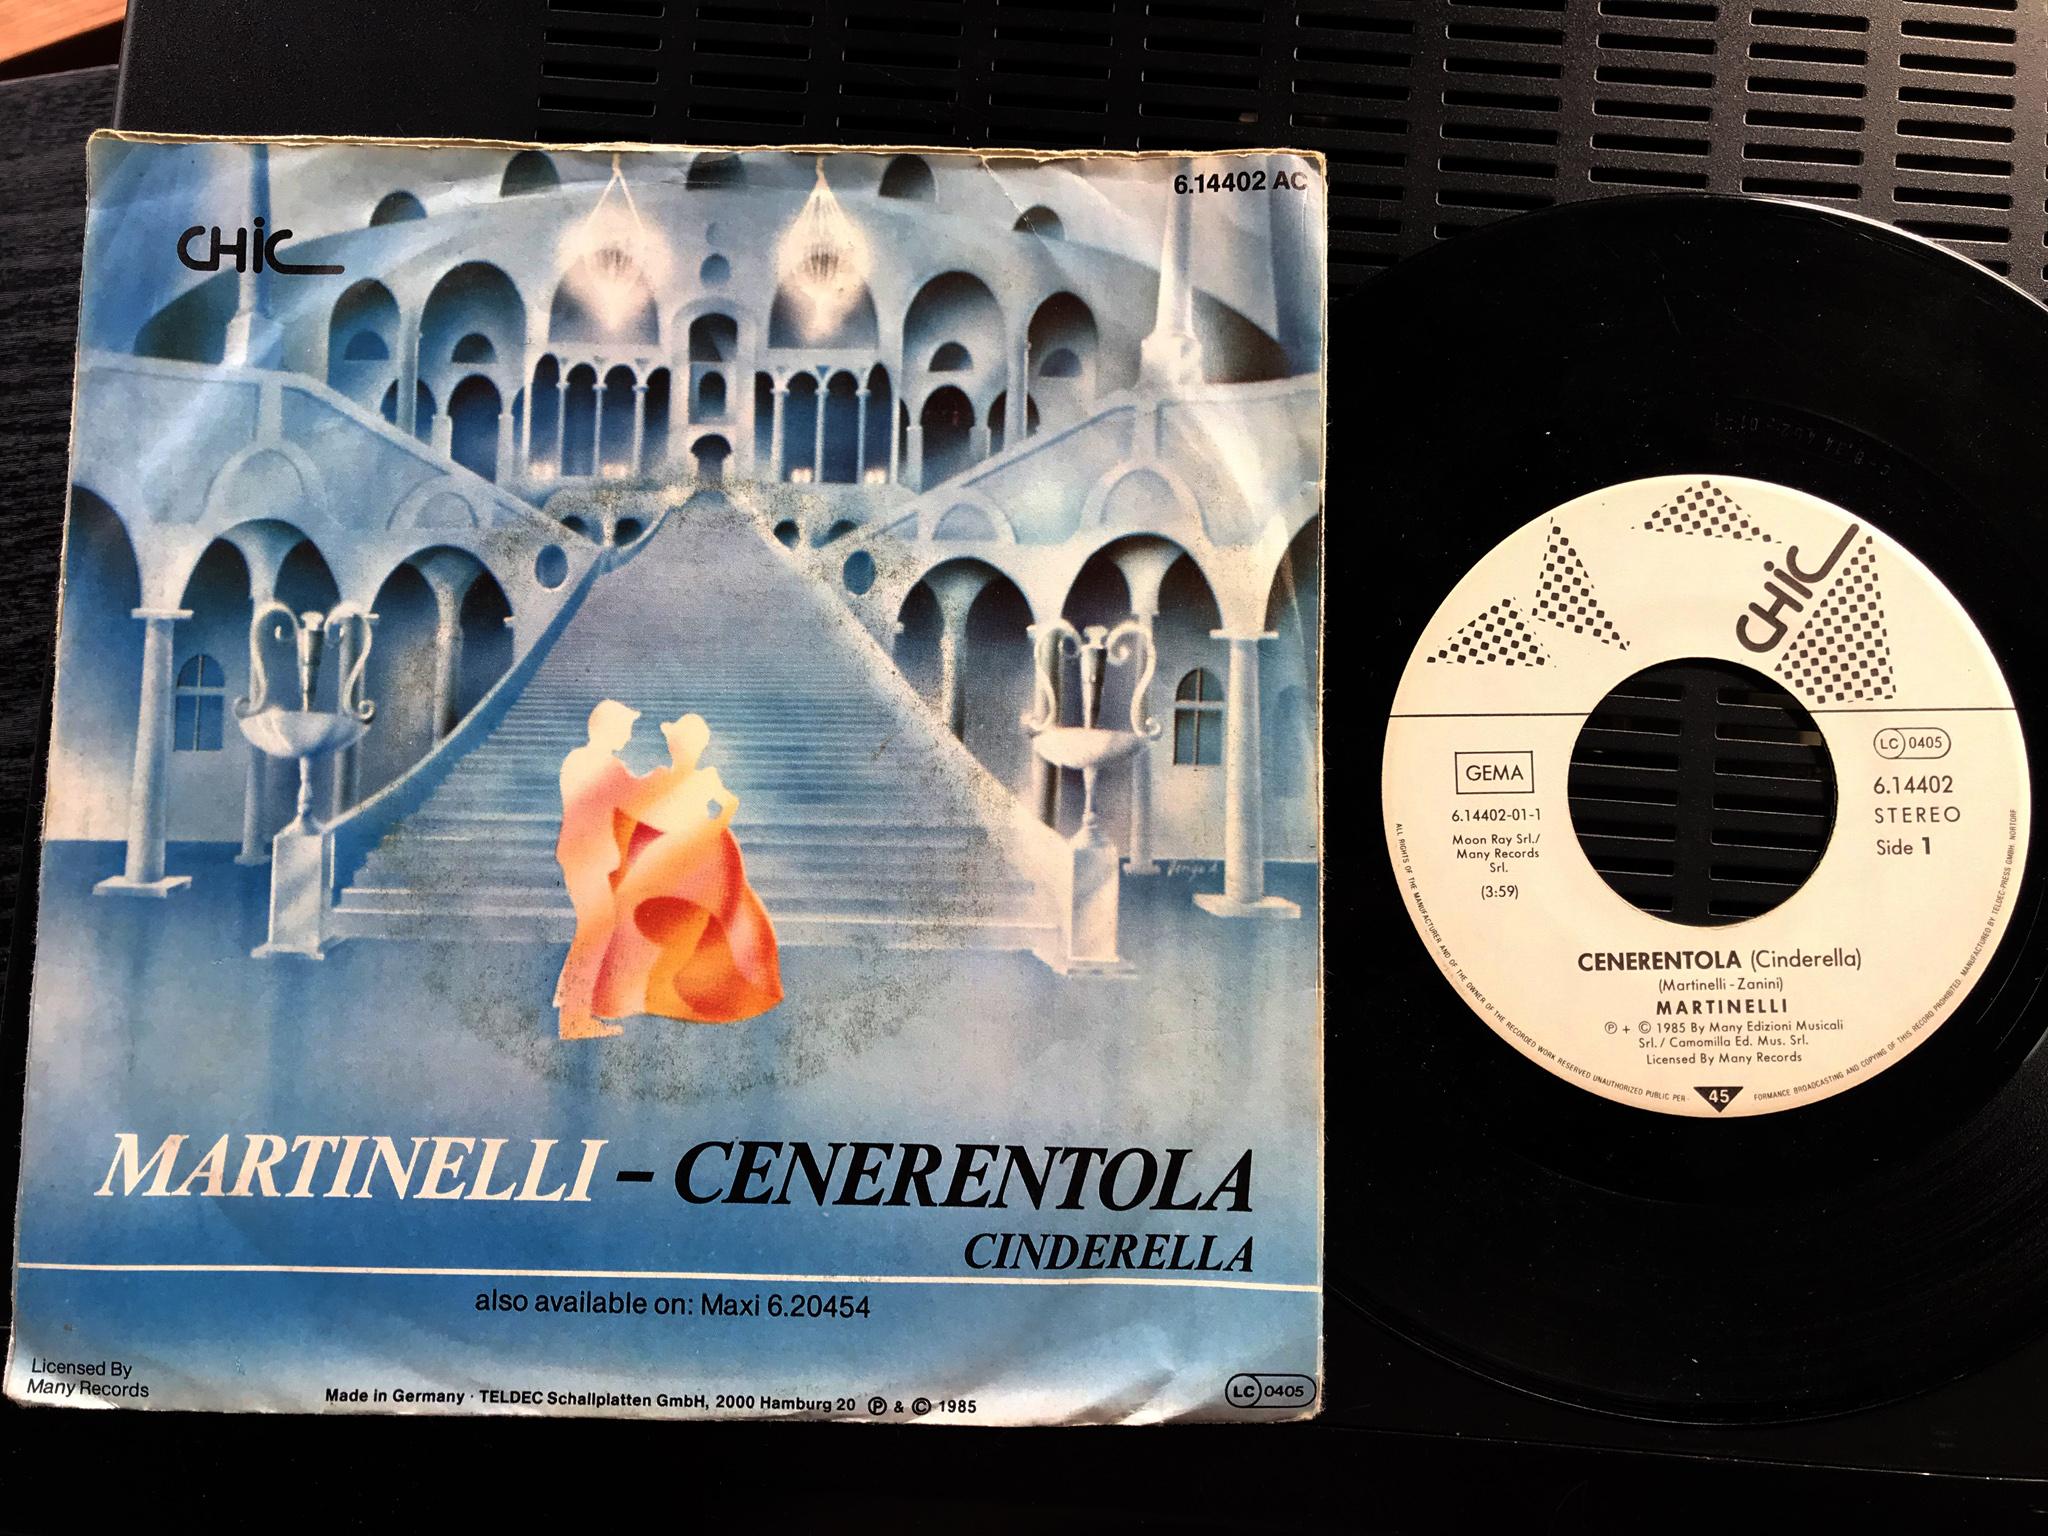 Martinelli - Cenerentola (Cinderella) 7